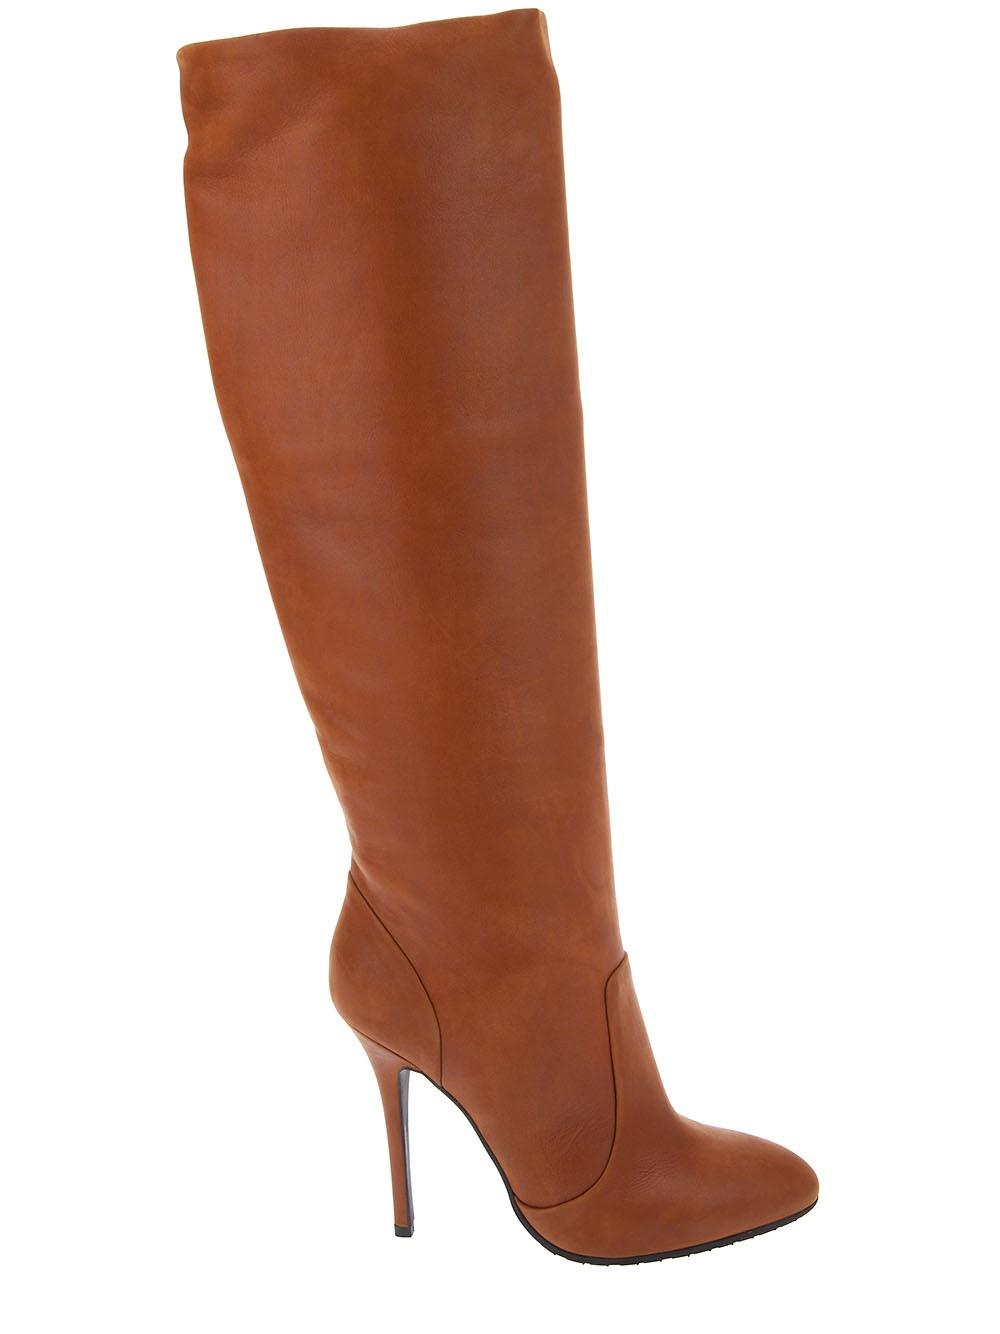 giuseppe zanotti knee high boot in brown lyst